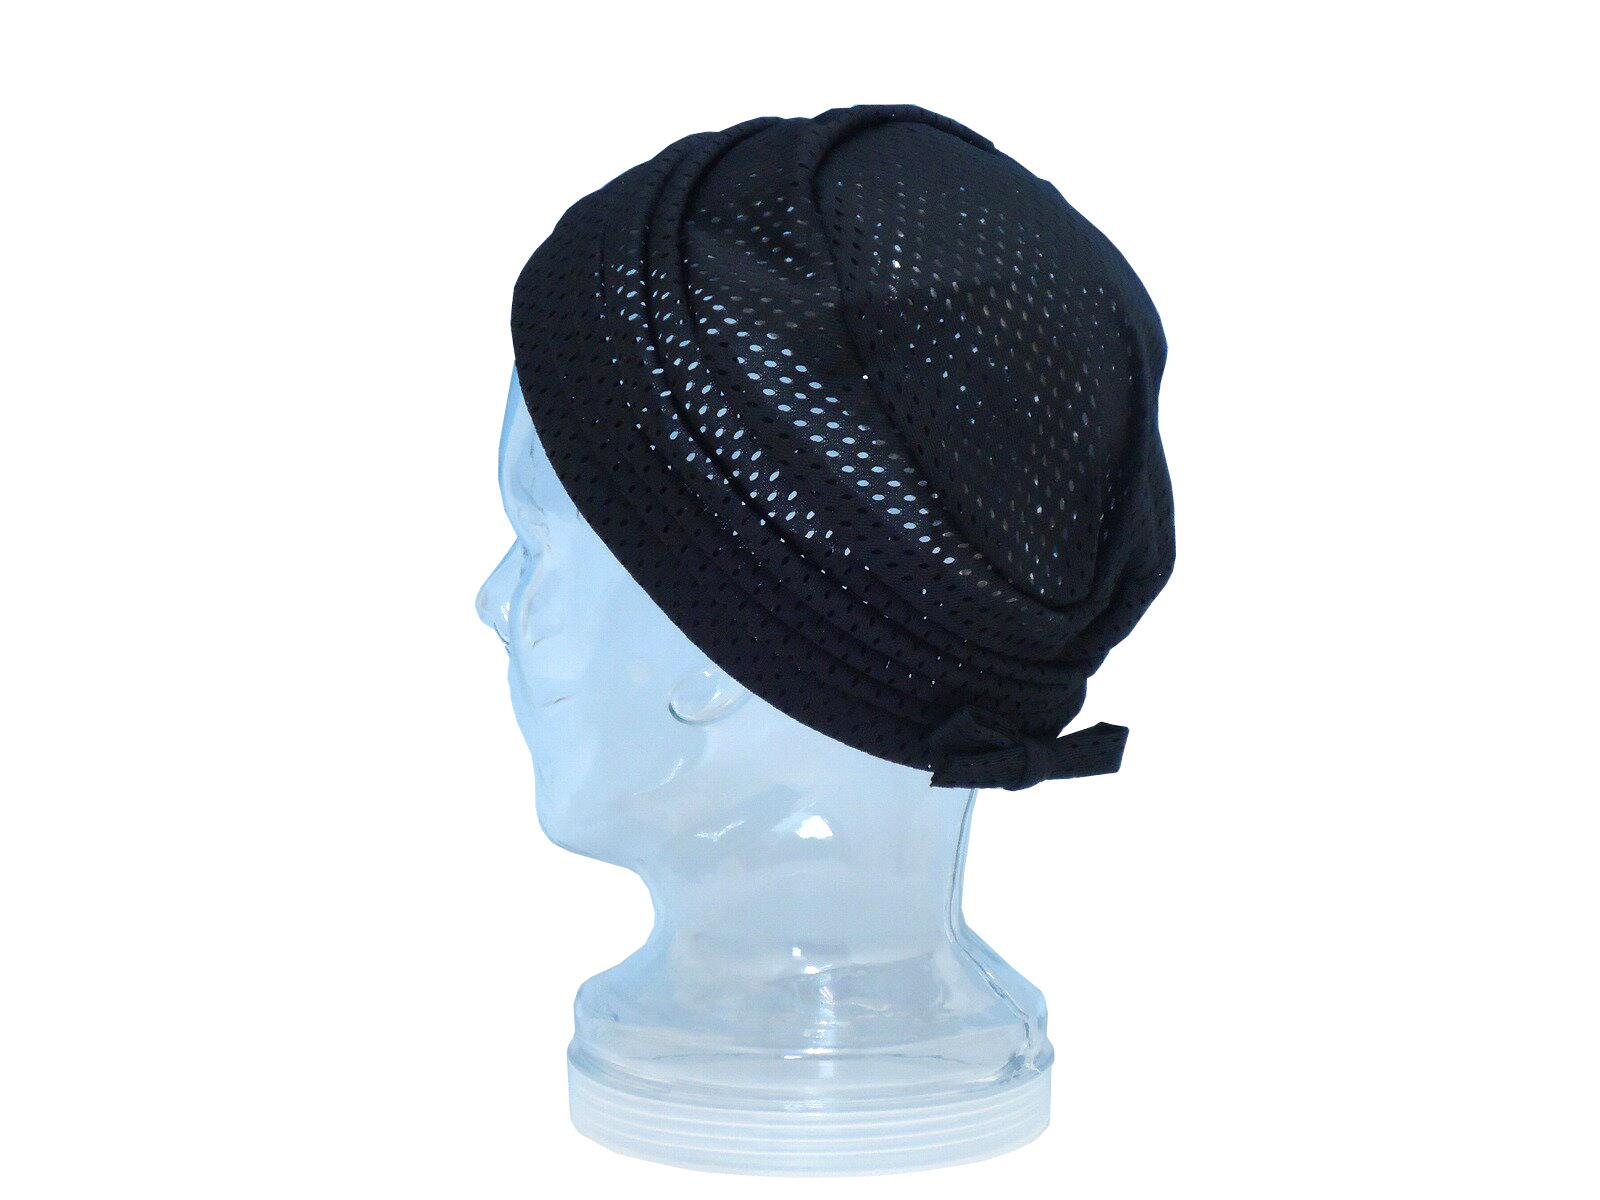 MADE IN JAPAN(日本製) 婦人帽子 パンチメッシュ ヘアキャップ ターバン 1833